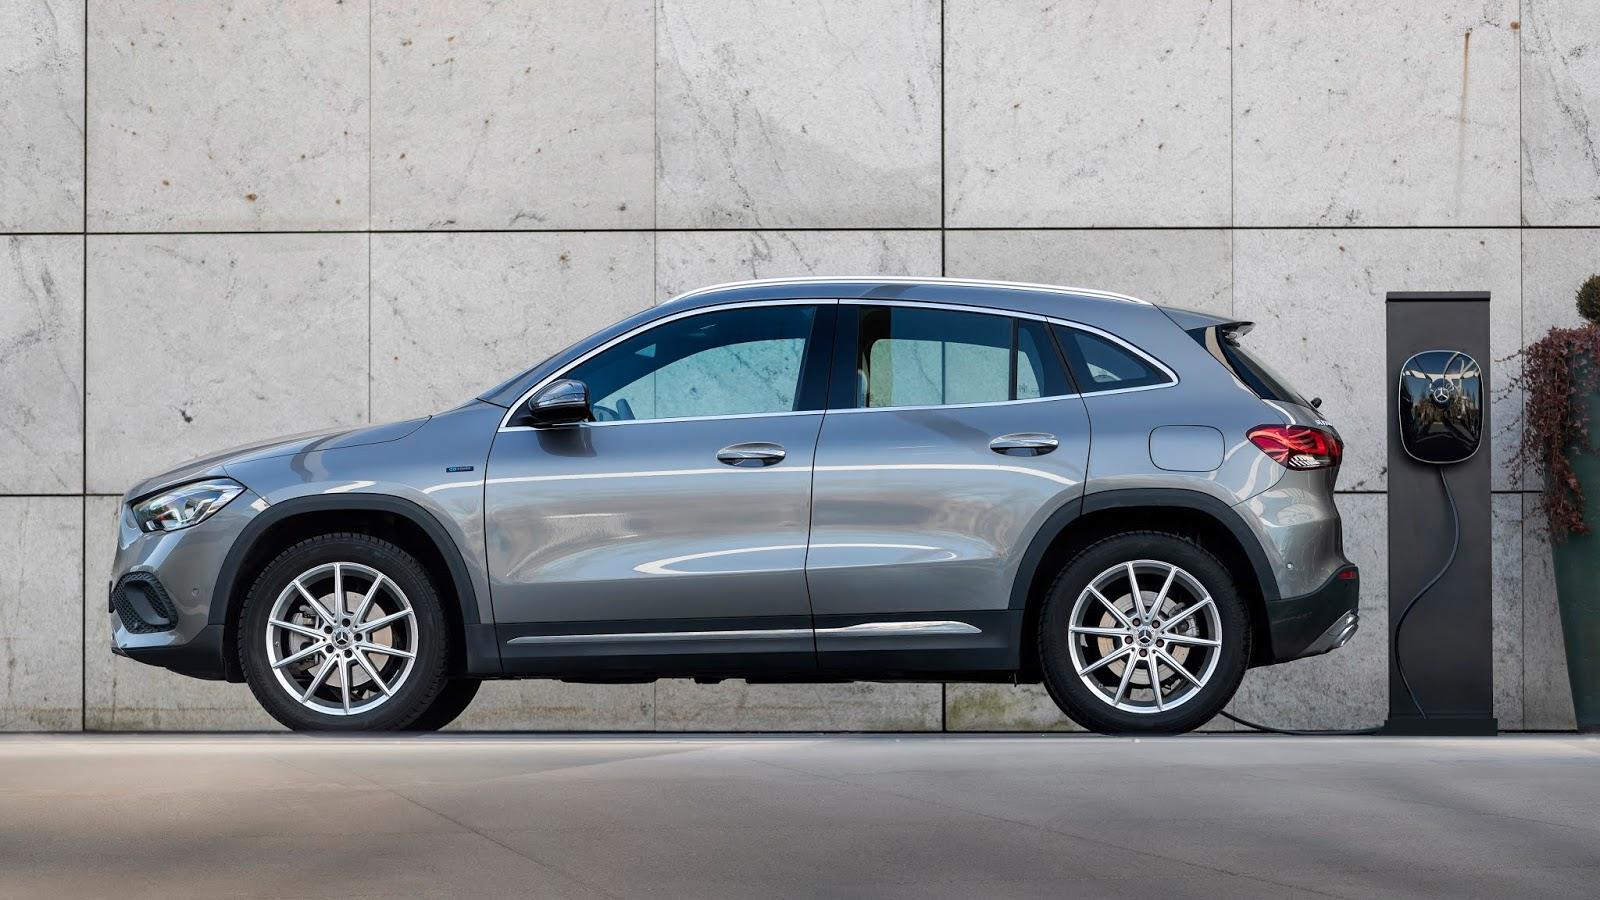 Mercedes2BGLA2B250e2B252822529 Τα νέα plug-in της Mercedes έχουν κατανάλωση από 0,9 lt/100 km ! Mercedes, Mercedes Benz, plug-in hybrid, zblog, ειδήσεις